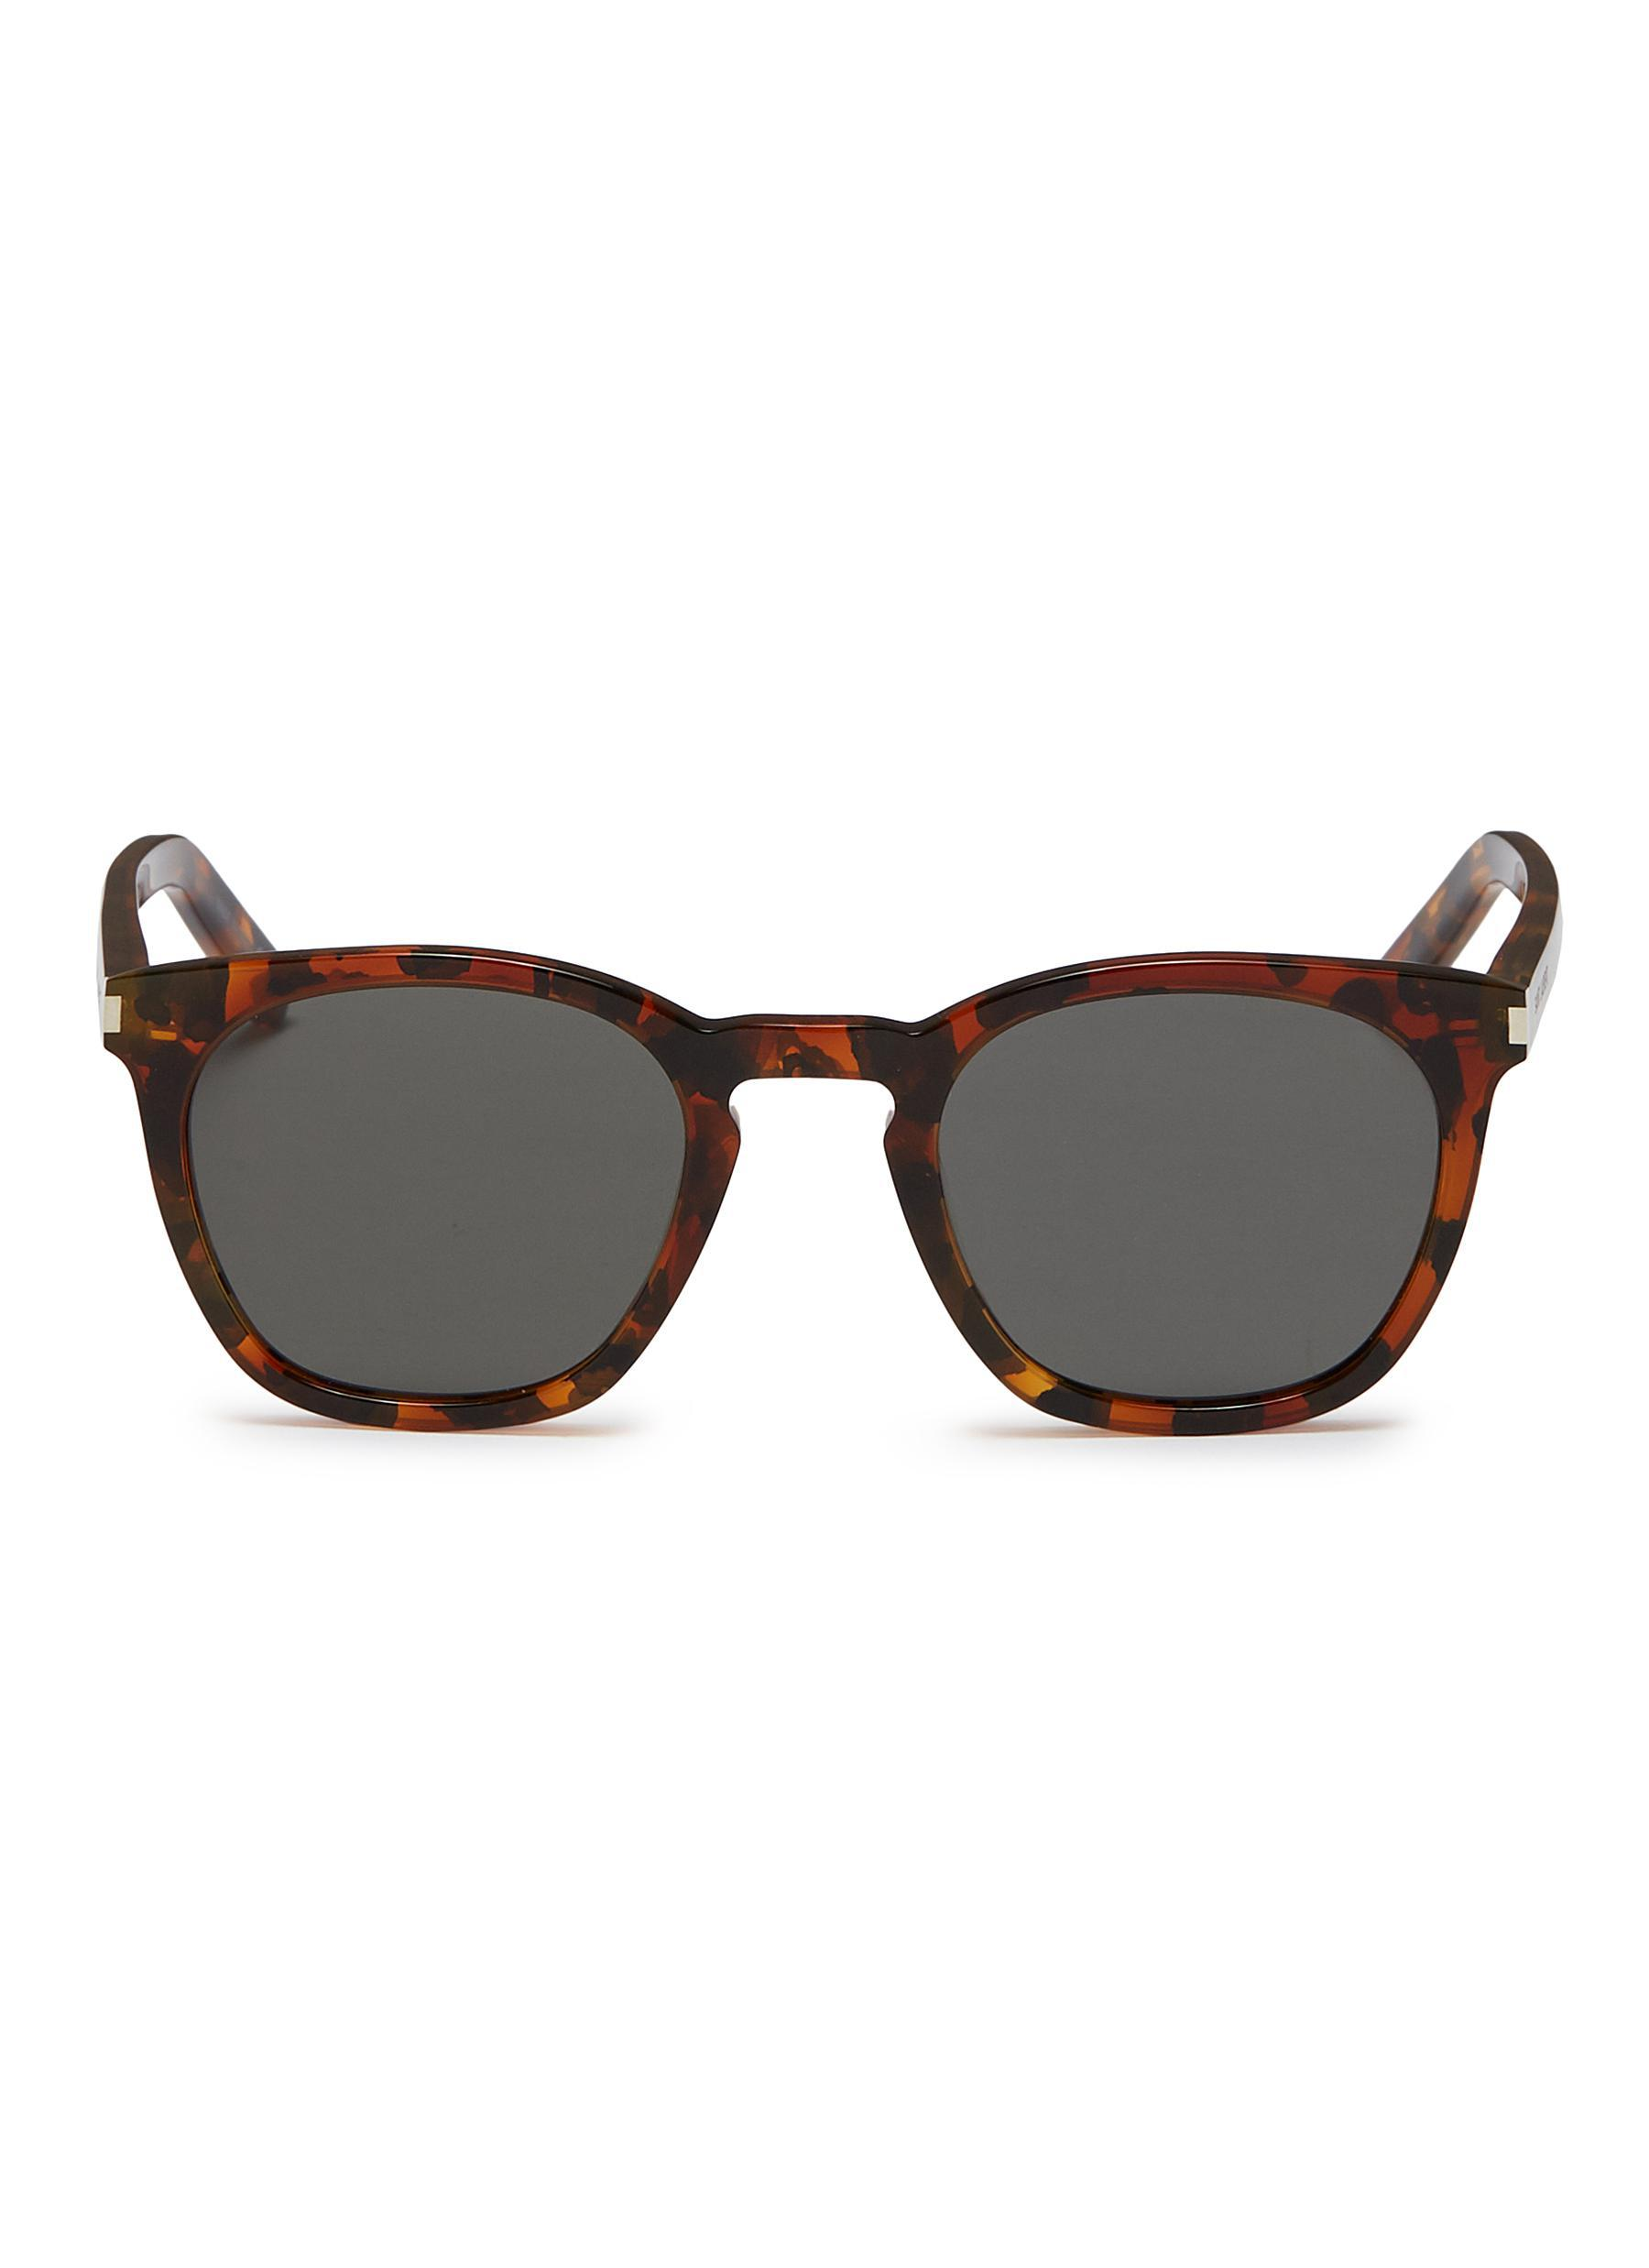 c8c008dd5aa6 Saint Laurent. Men s  classic 28  Tortoiseshell Acetate Square Sunglasses